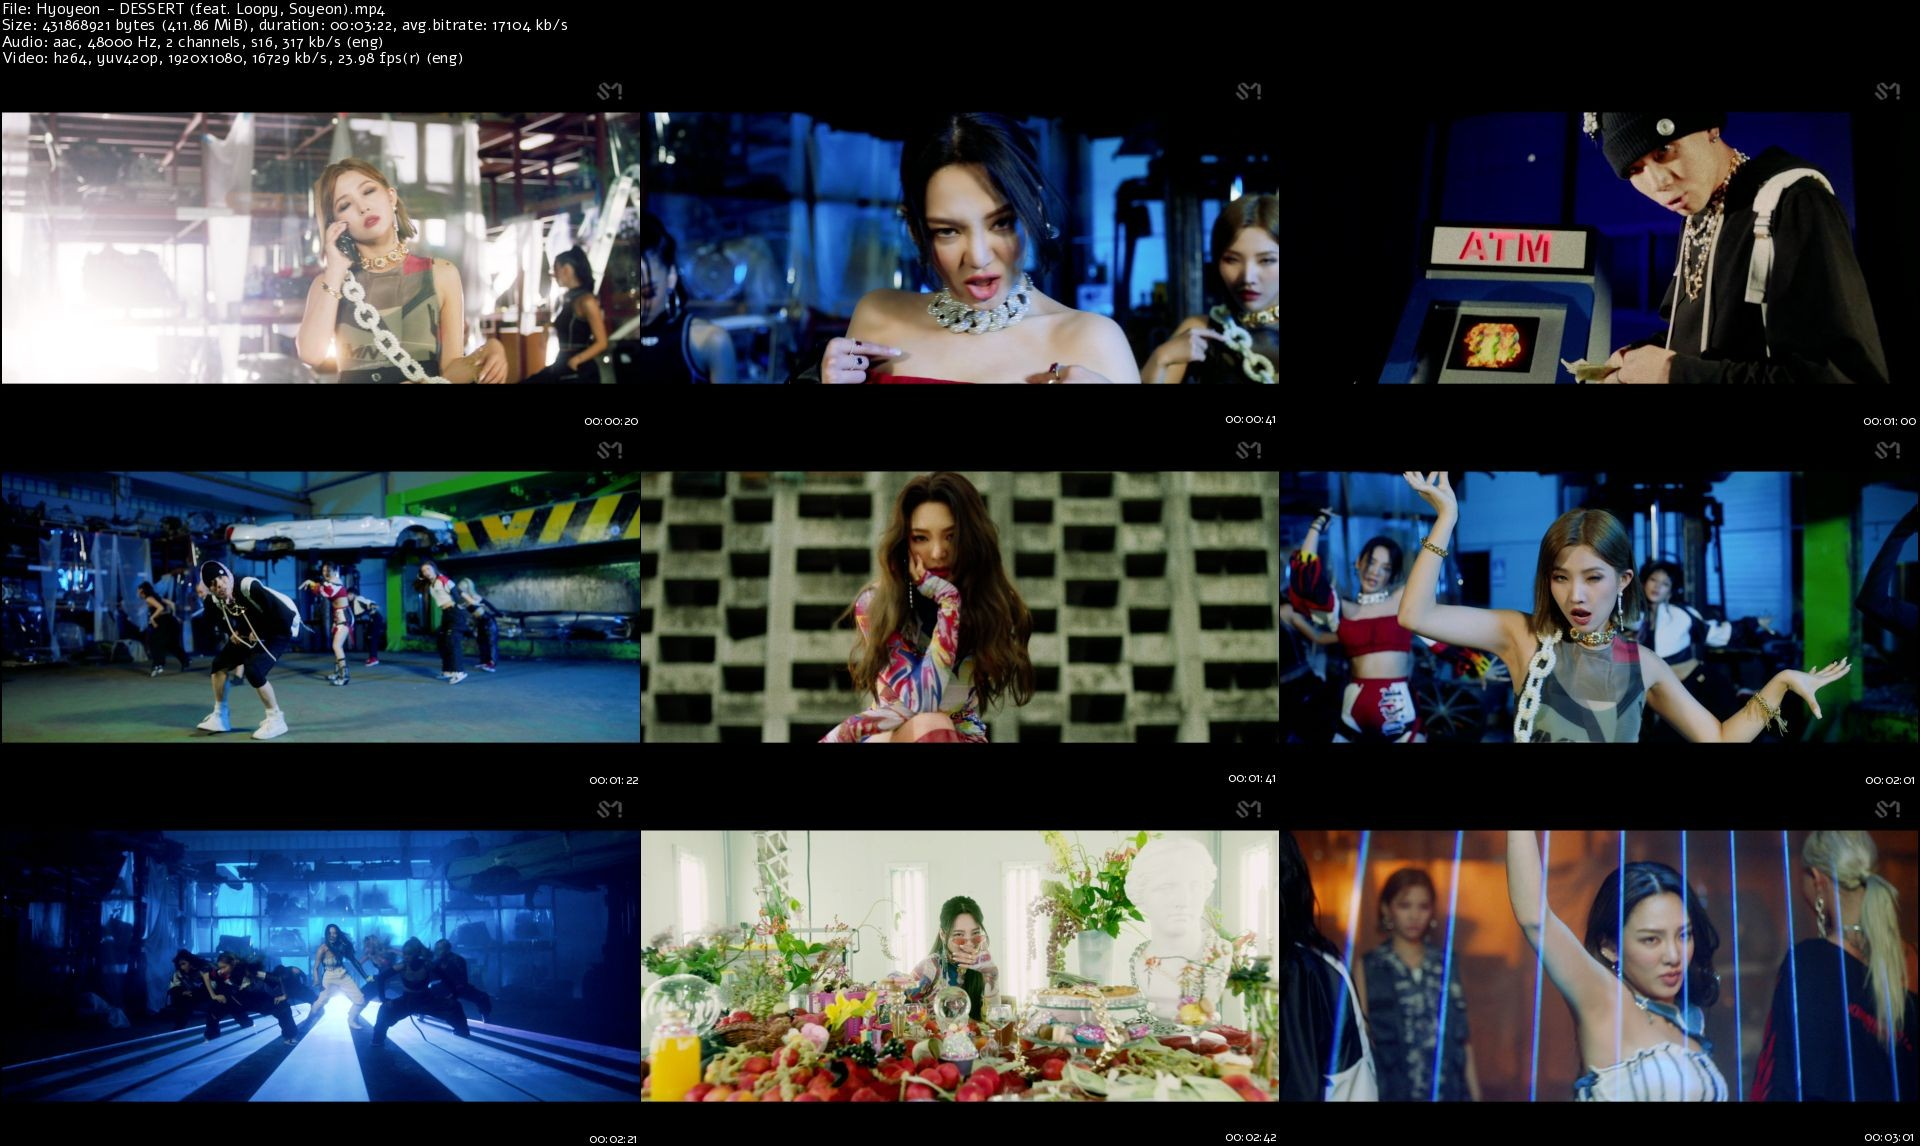 Hyoyeon (효연) – DESSERT (feat. Loopy, Soyeon) [MP4 1080p / WEB / Bugs] [2020.07.22]